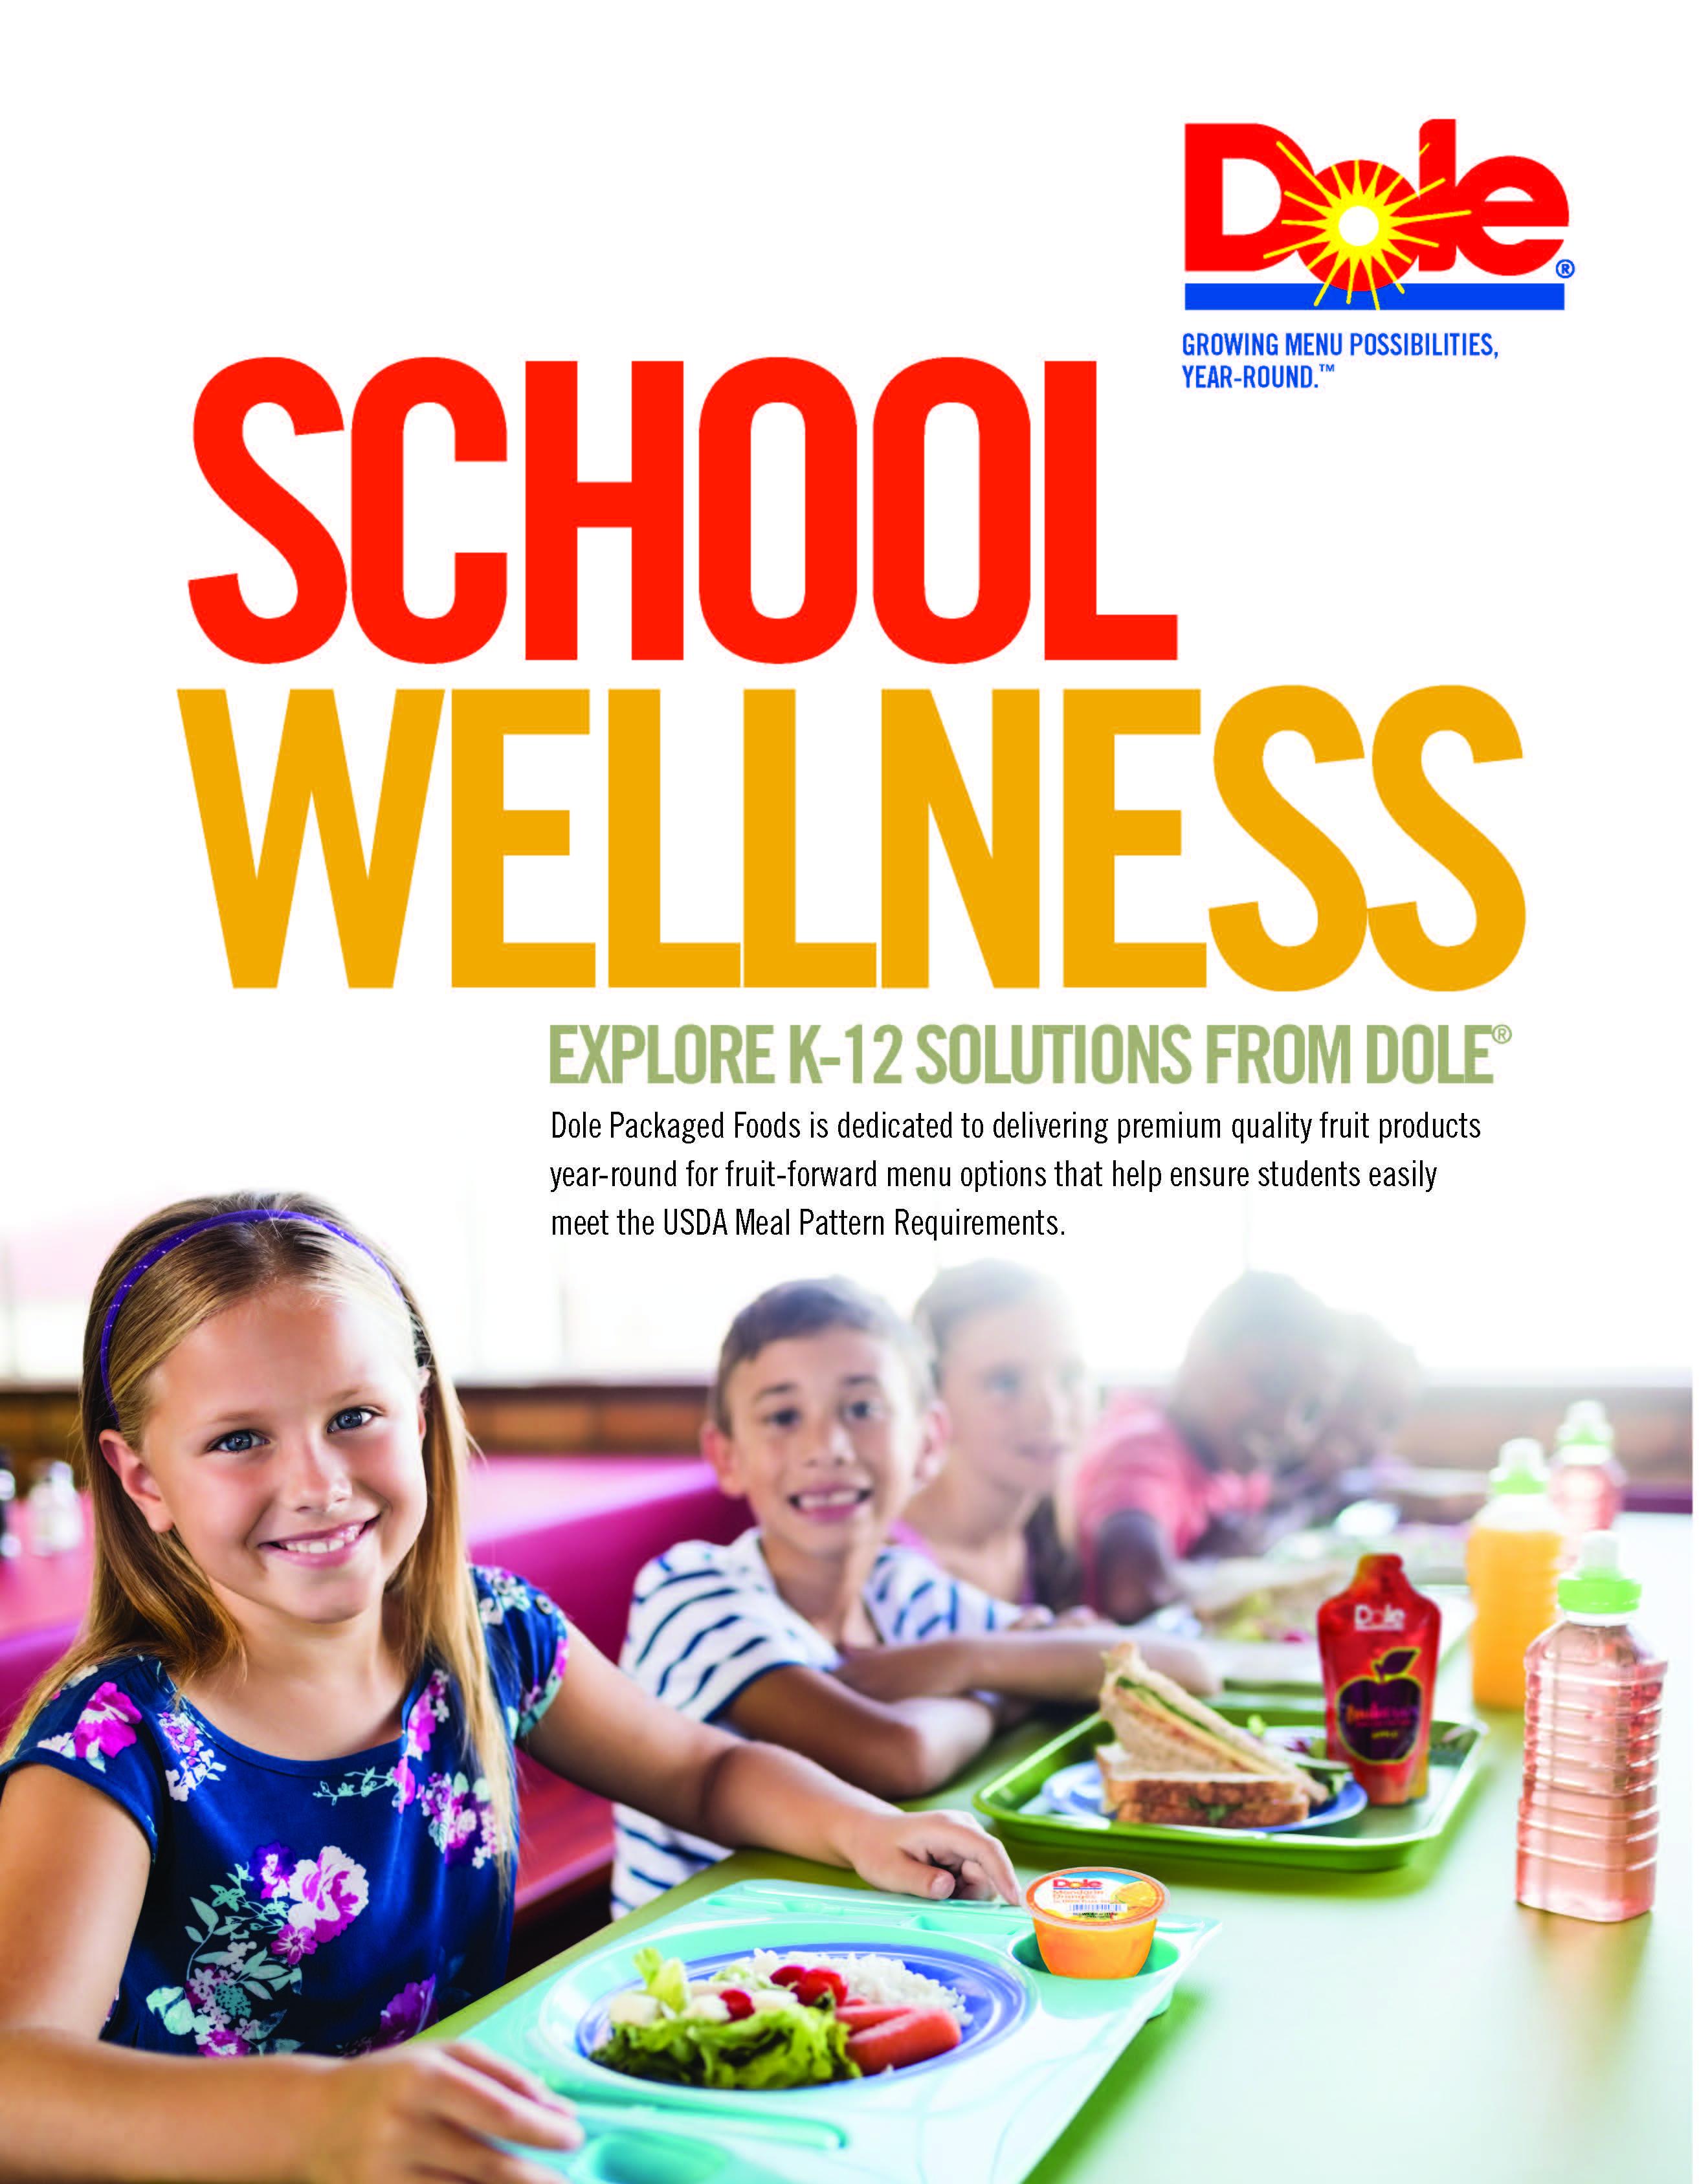 Dole school wellness brochure v3 page 1 en8nfu